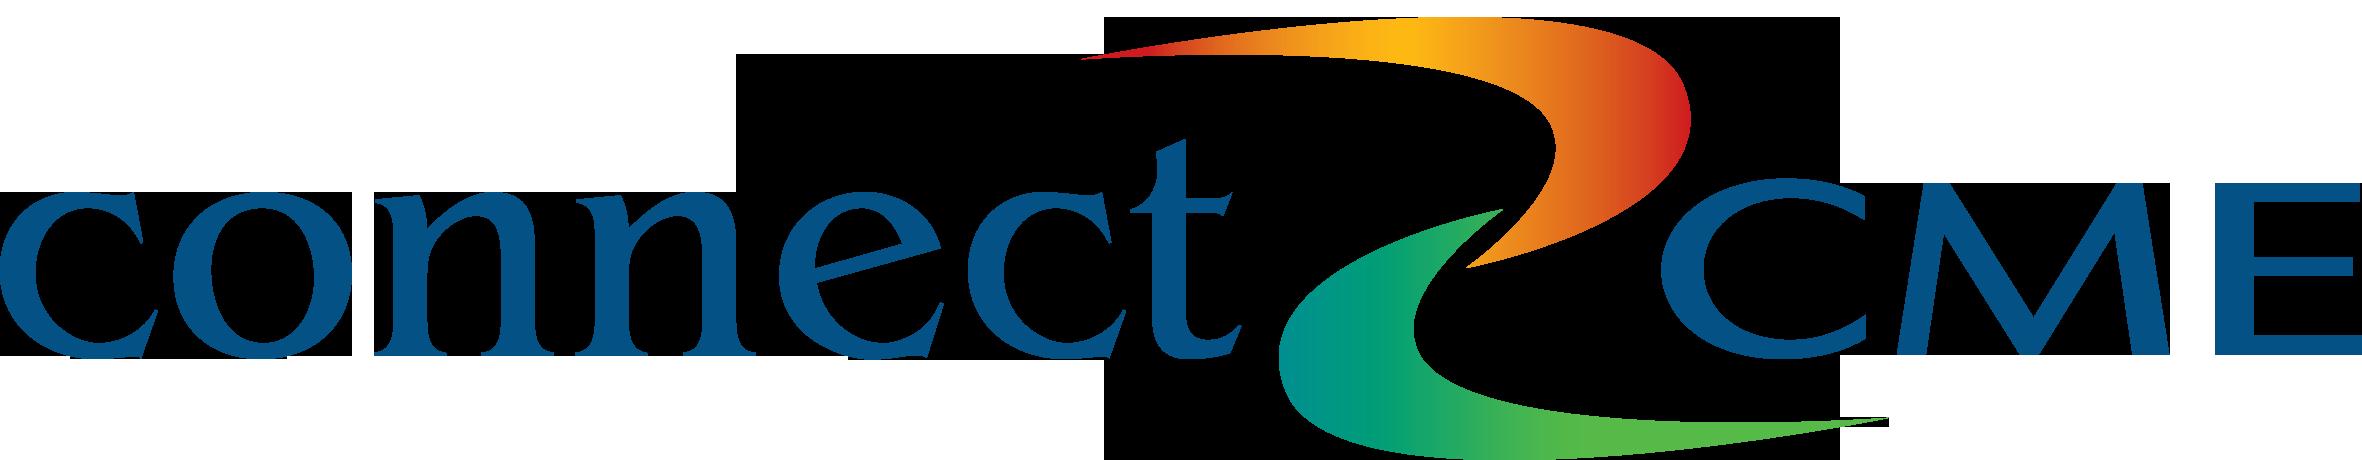 Connect2 CME logo